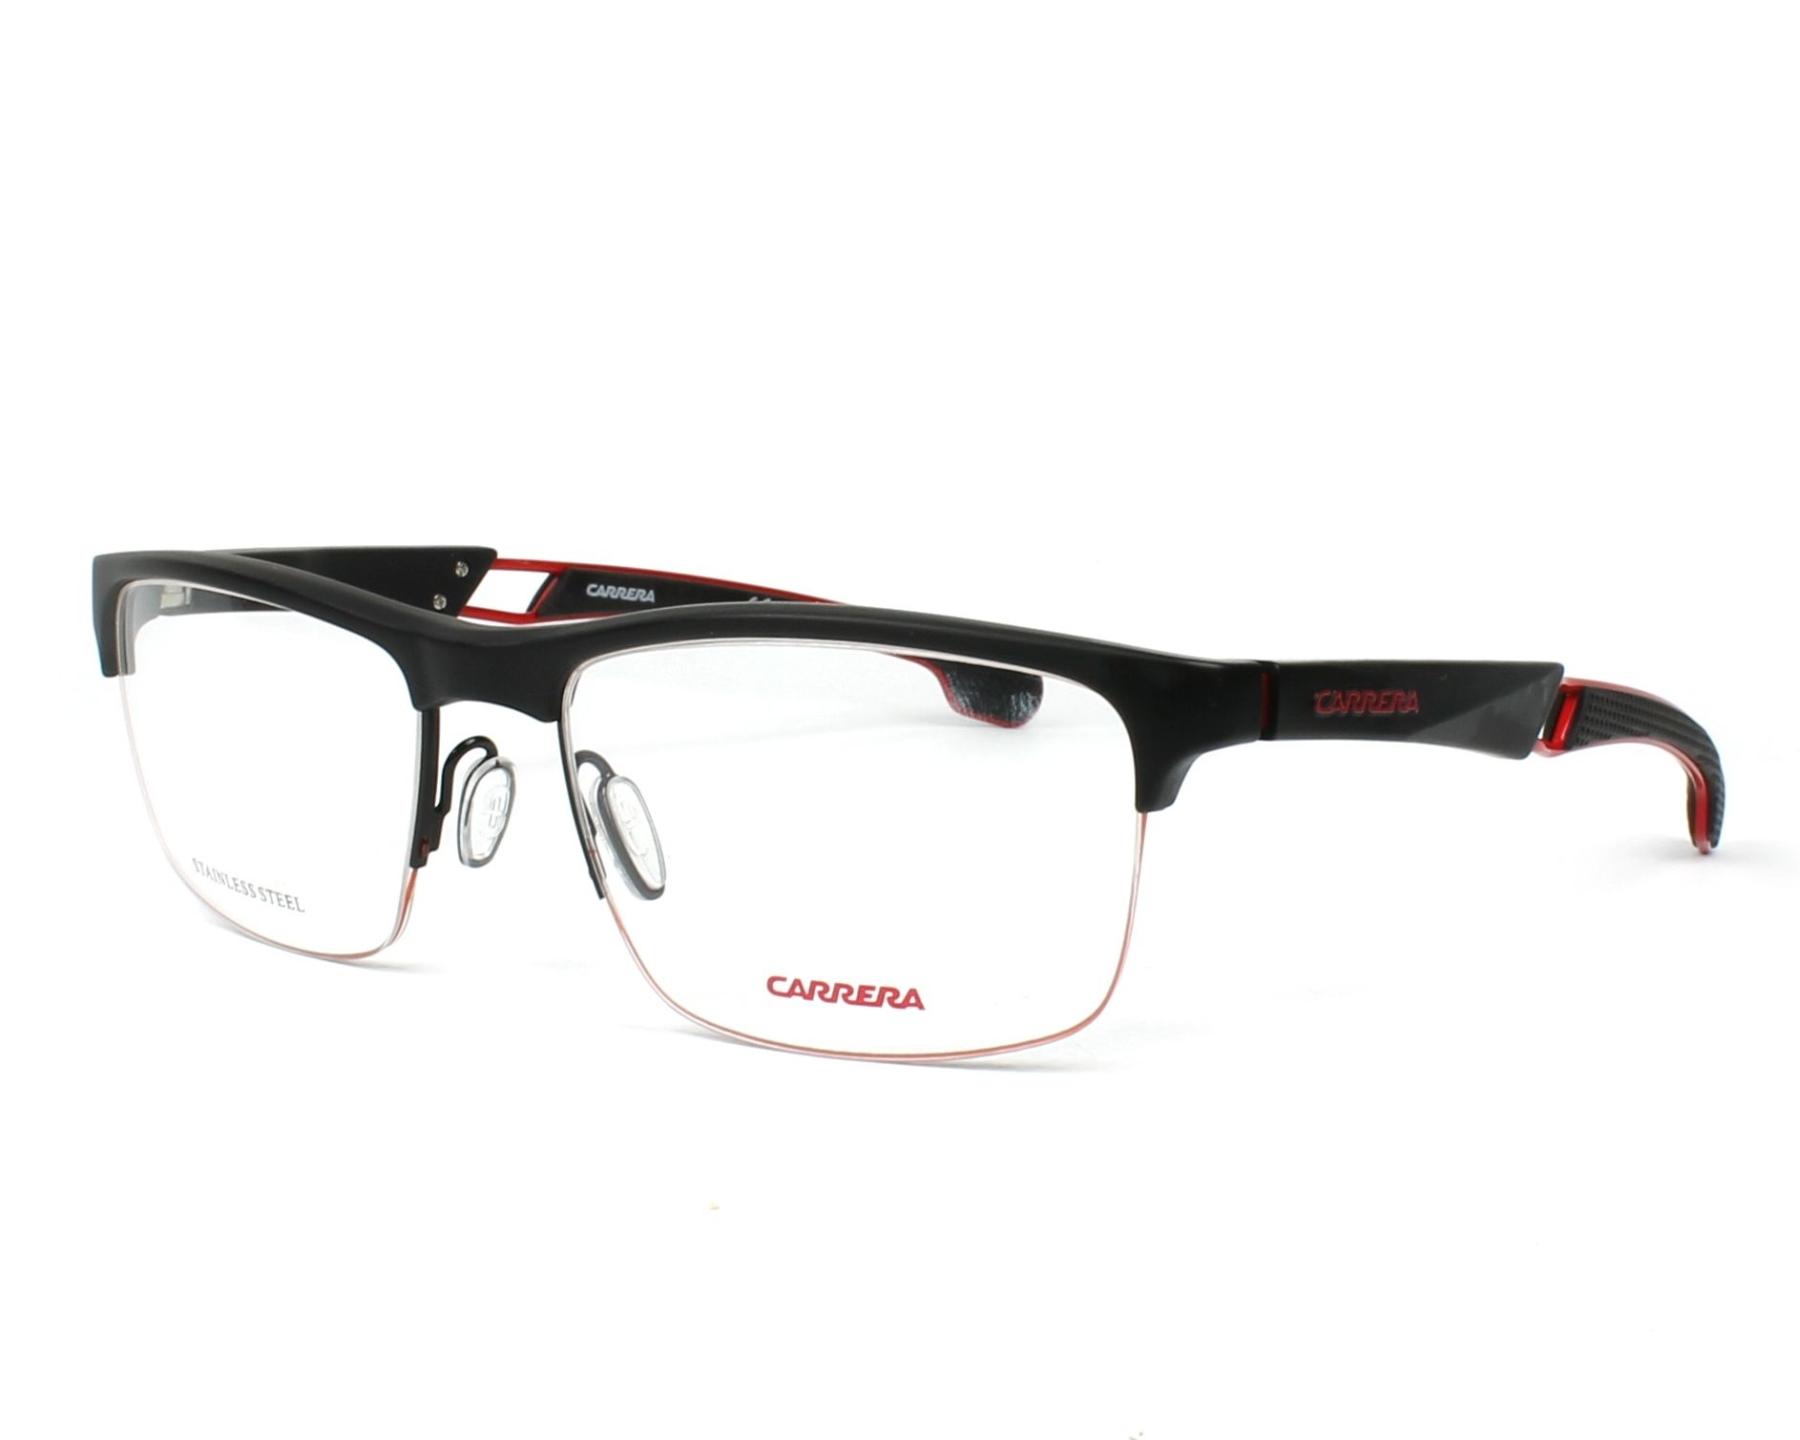 be9fc0f05 eyeglasses Carrera 4403-V 003 55-17 Black Red profile view